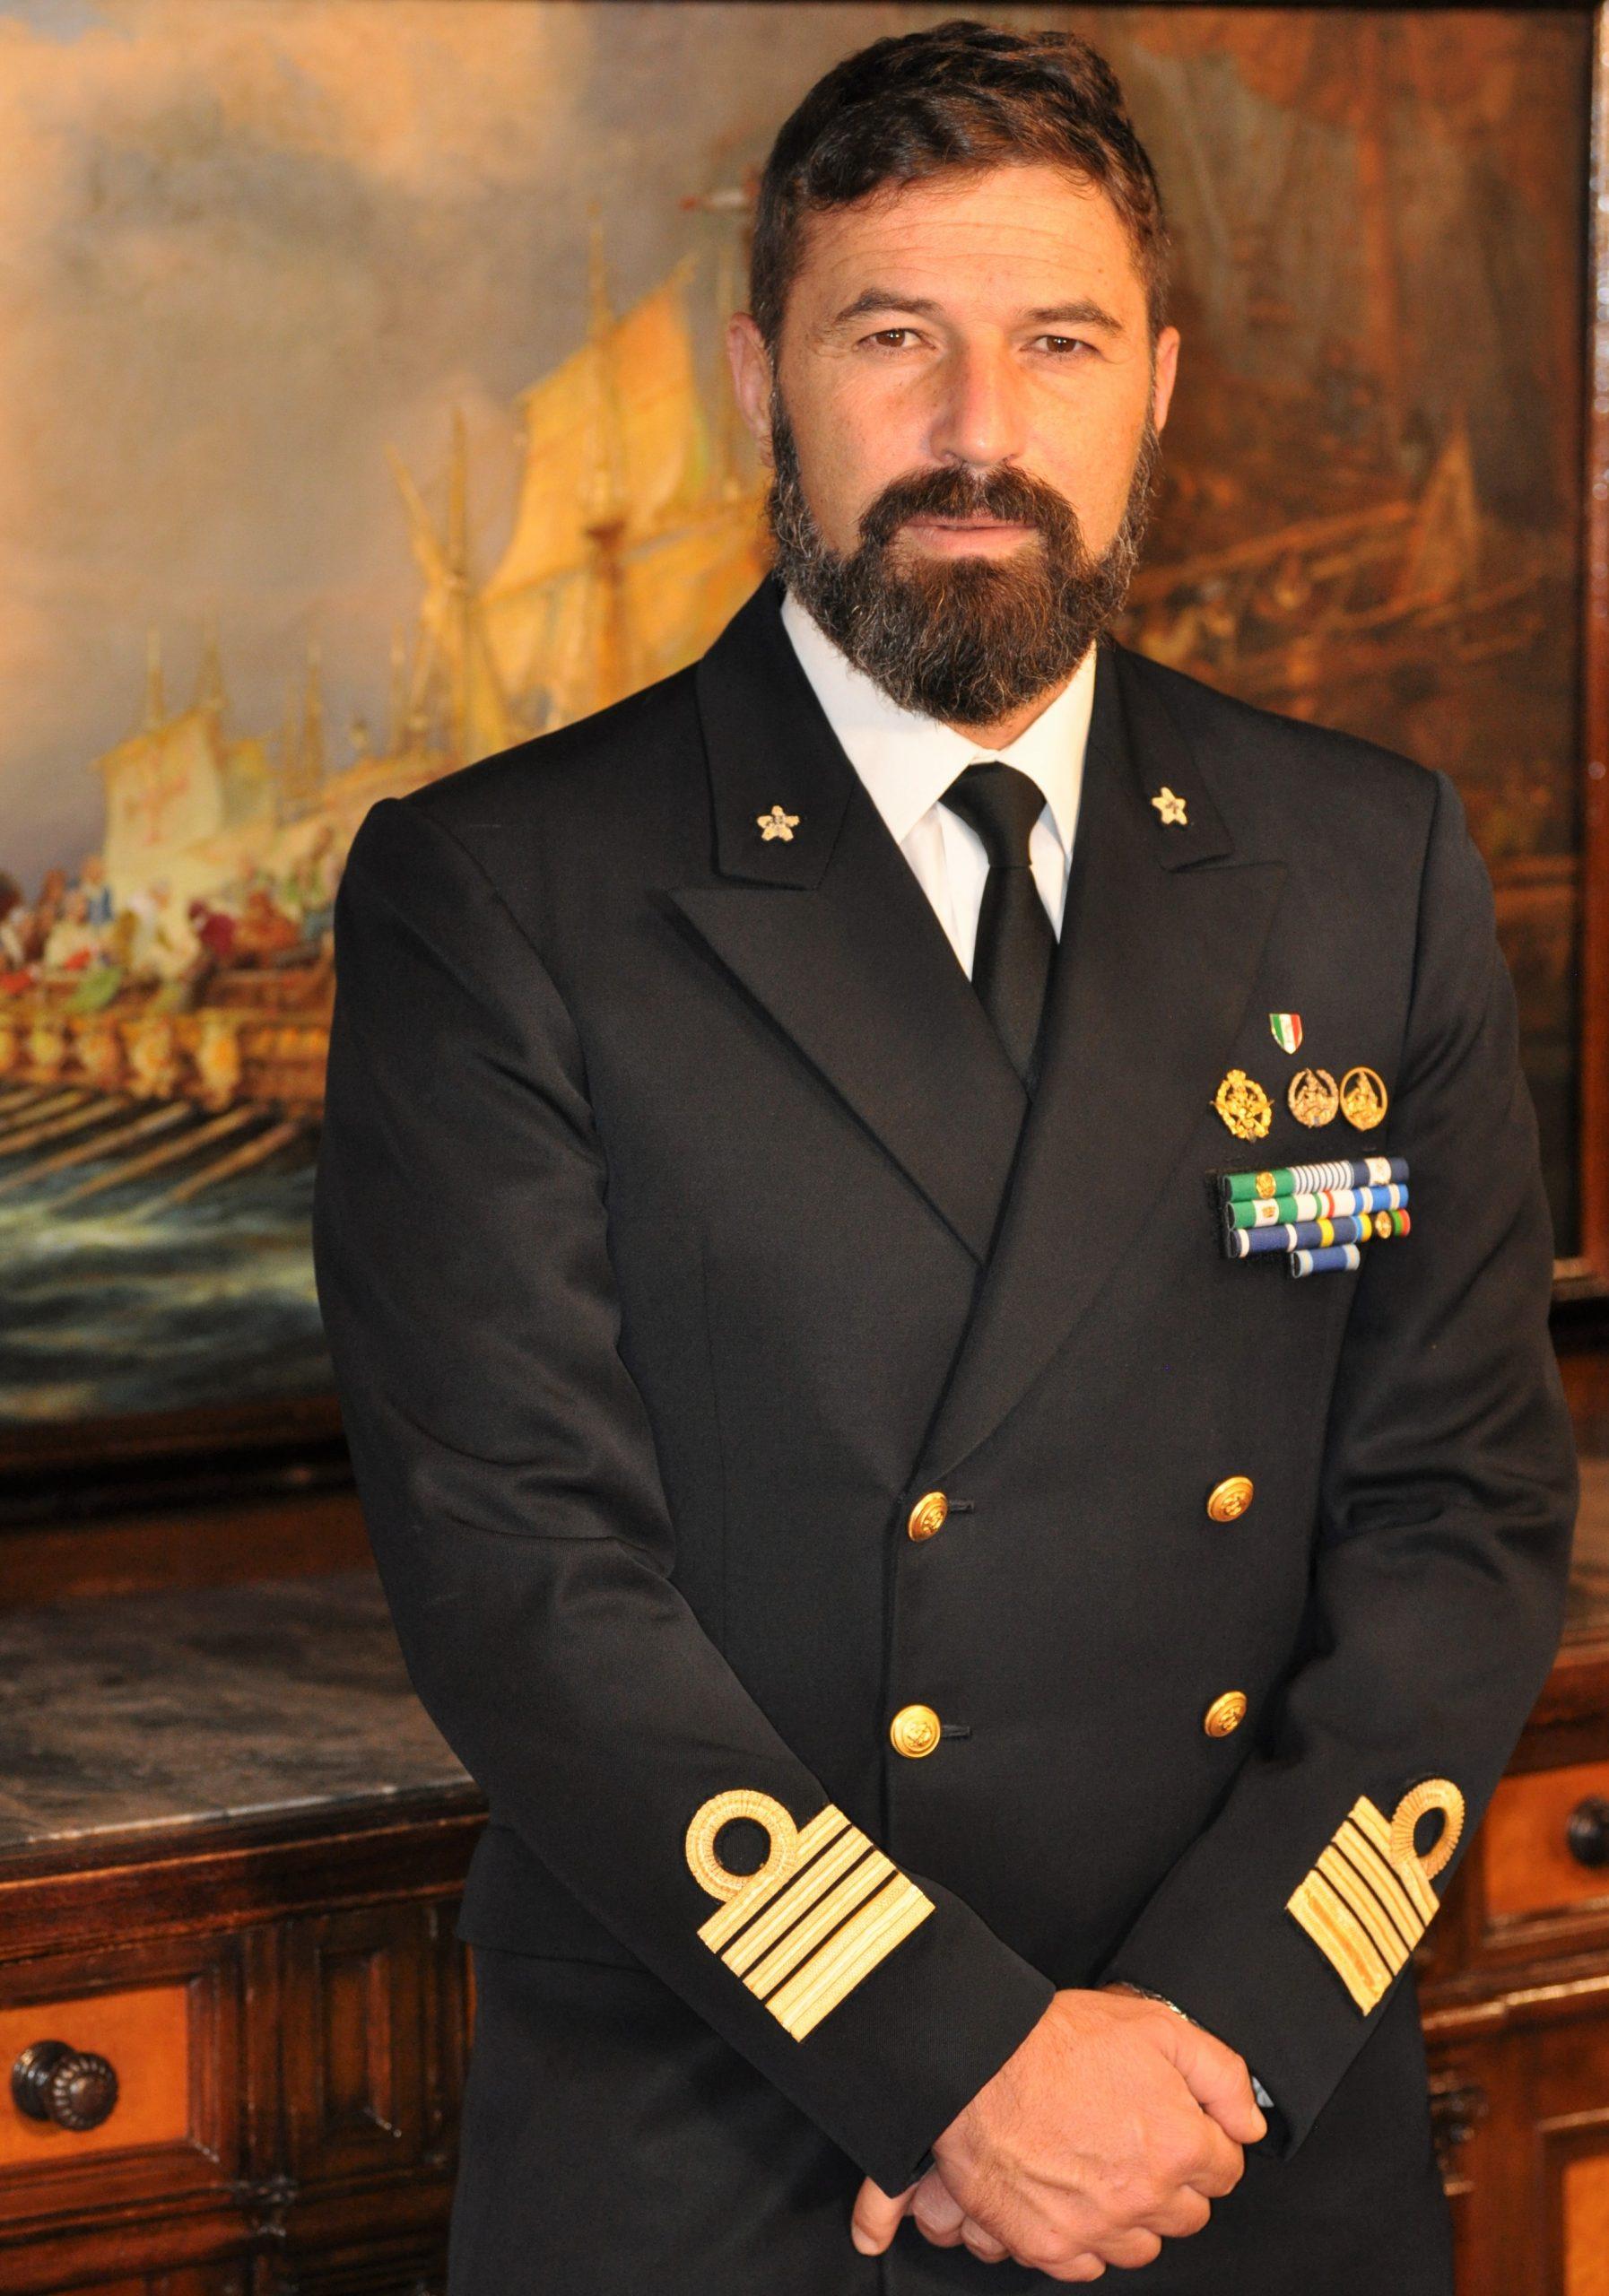 Gianfranco Bacchi